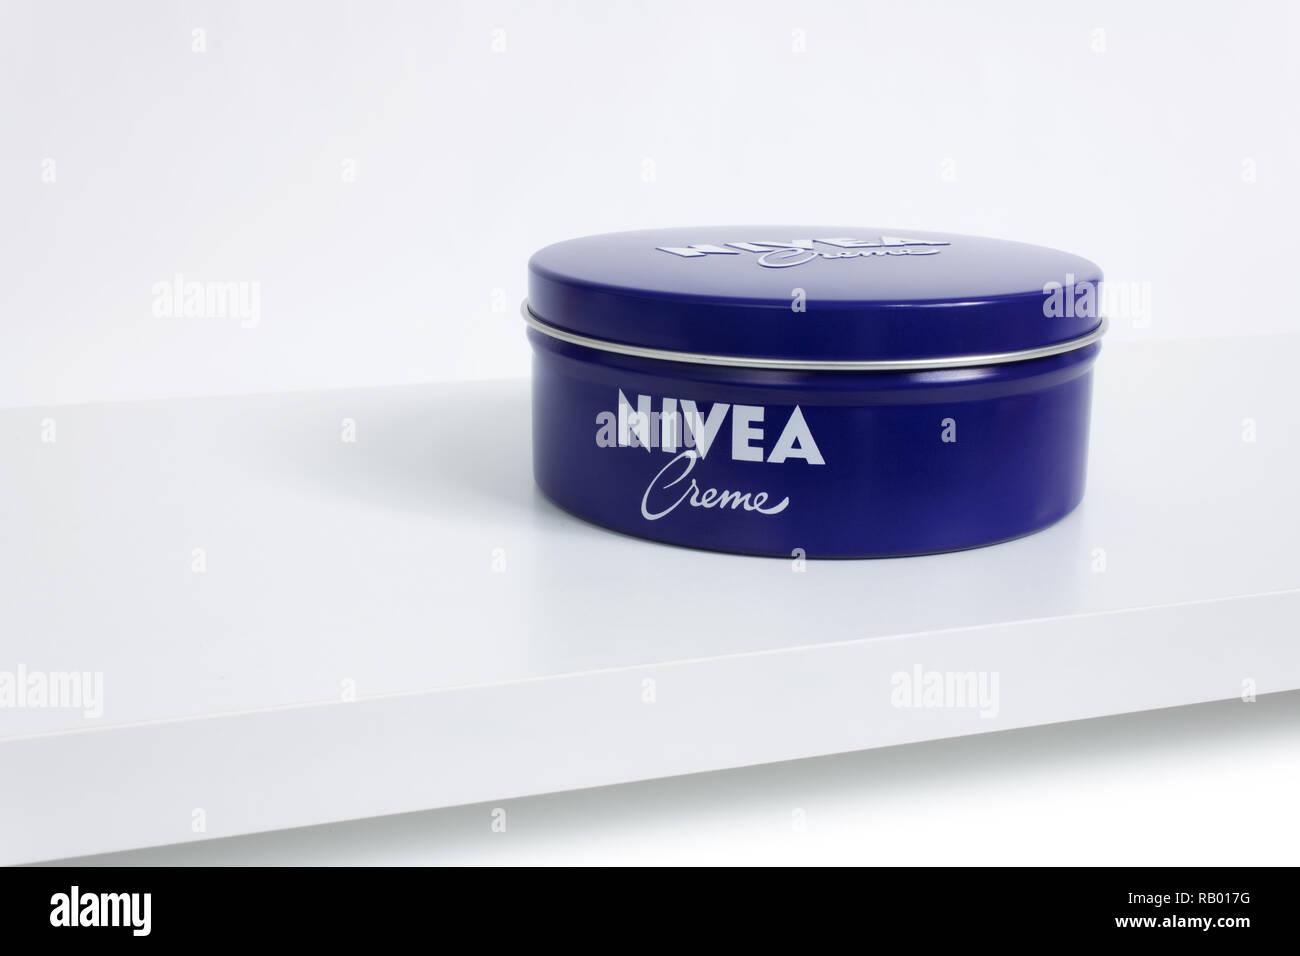 Prague, CZECH REPUBLIC - DECEMBER 31, 2018: Nivea Creme, the world's famous skin cream skin cream in a metal jar laid on white shelf Stock Photo